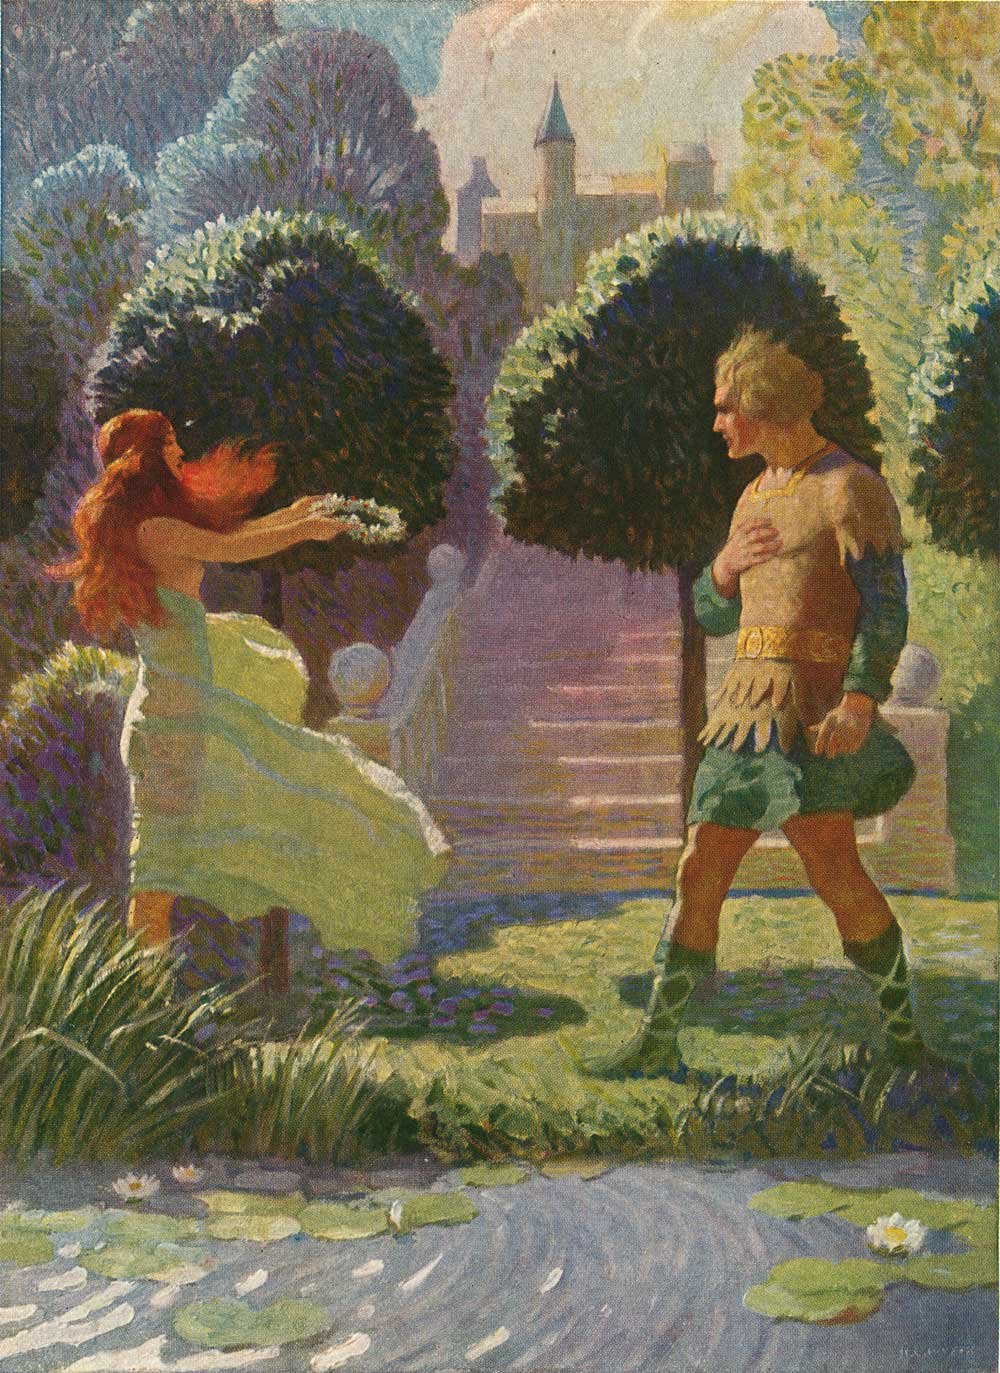 NC Wyeth charlemagne